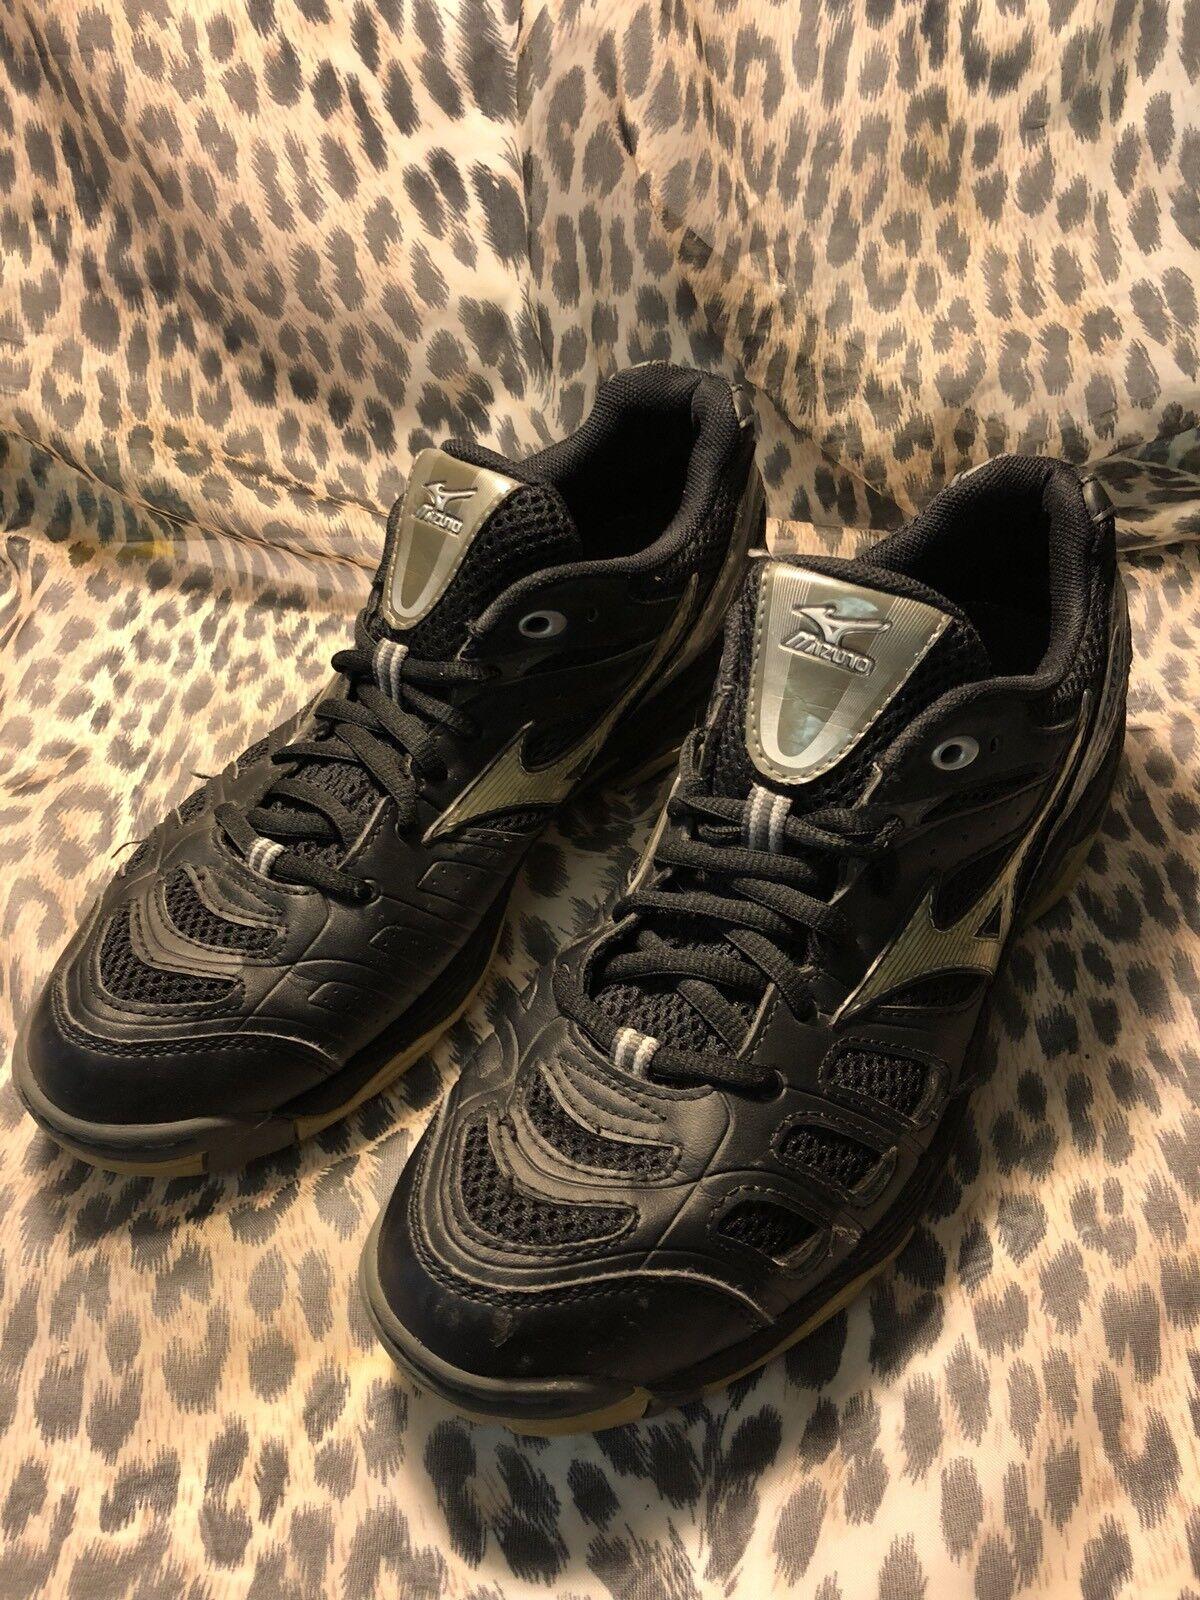 Mizuno Althletic Wave Rally Women's Running/Walking Althletic Mizuno Shoes SZ 10M d84f63